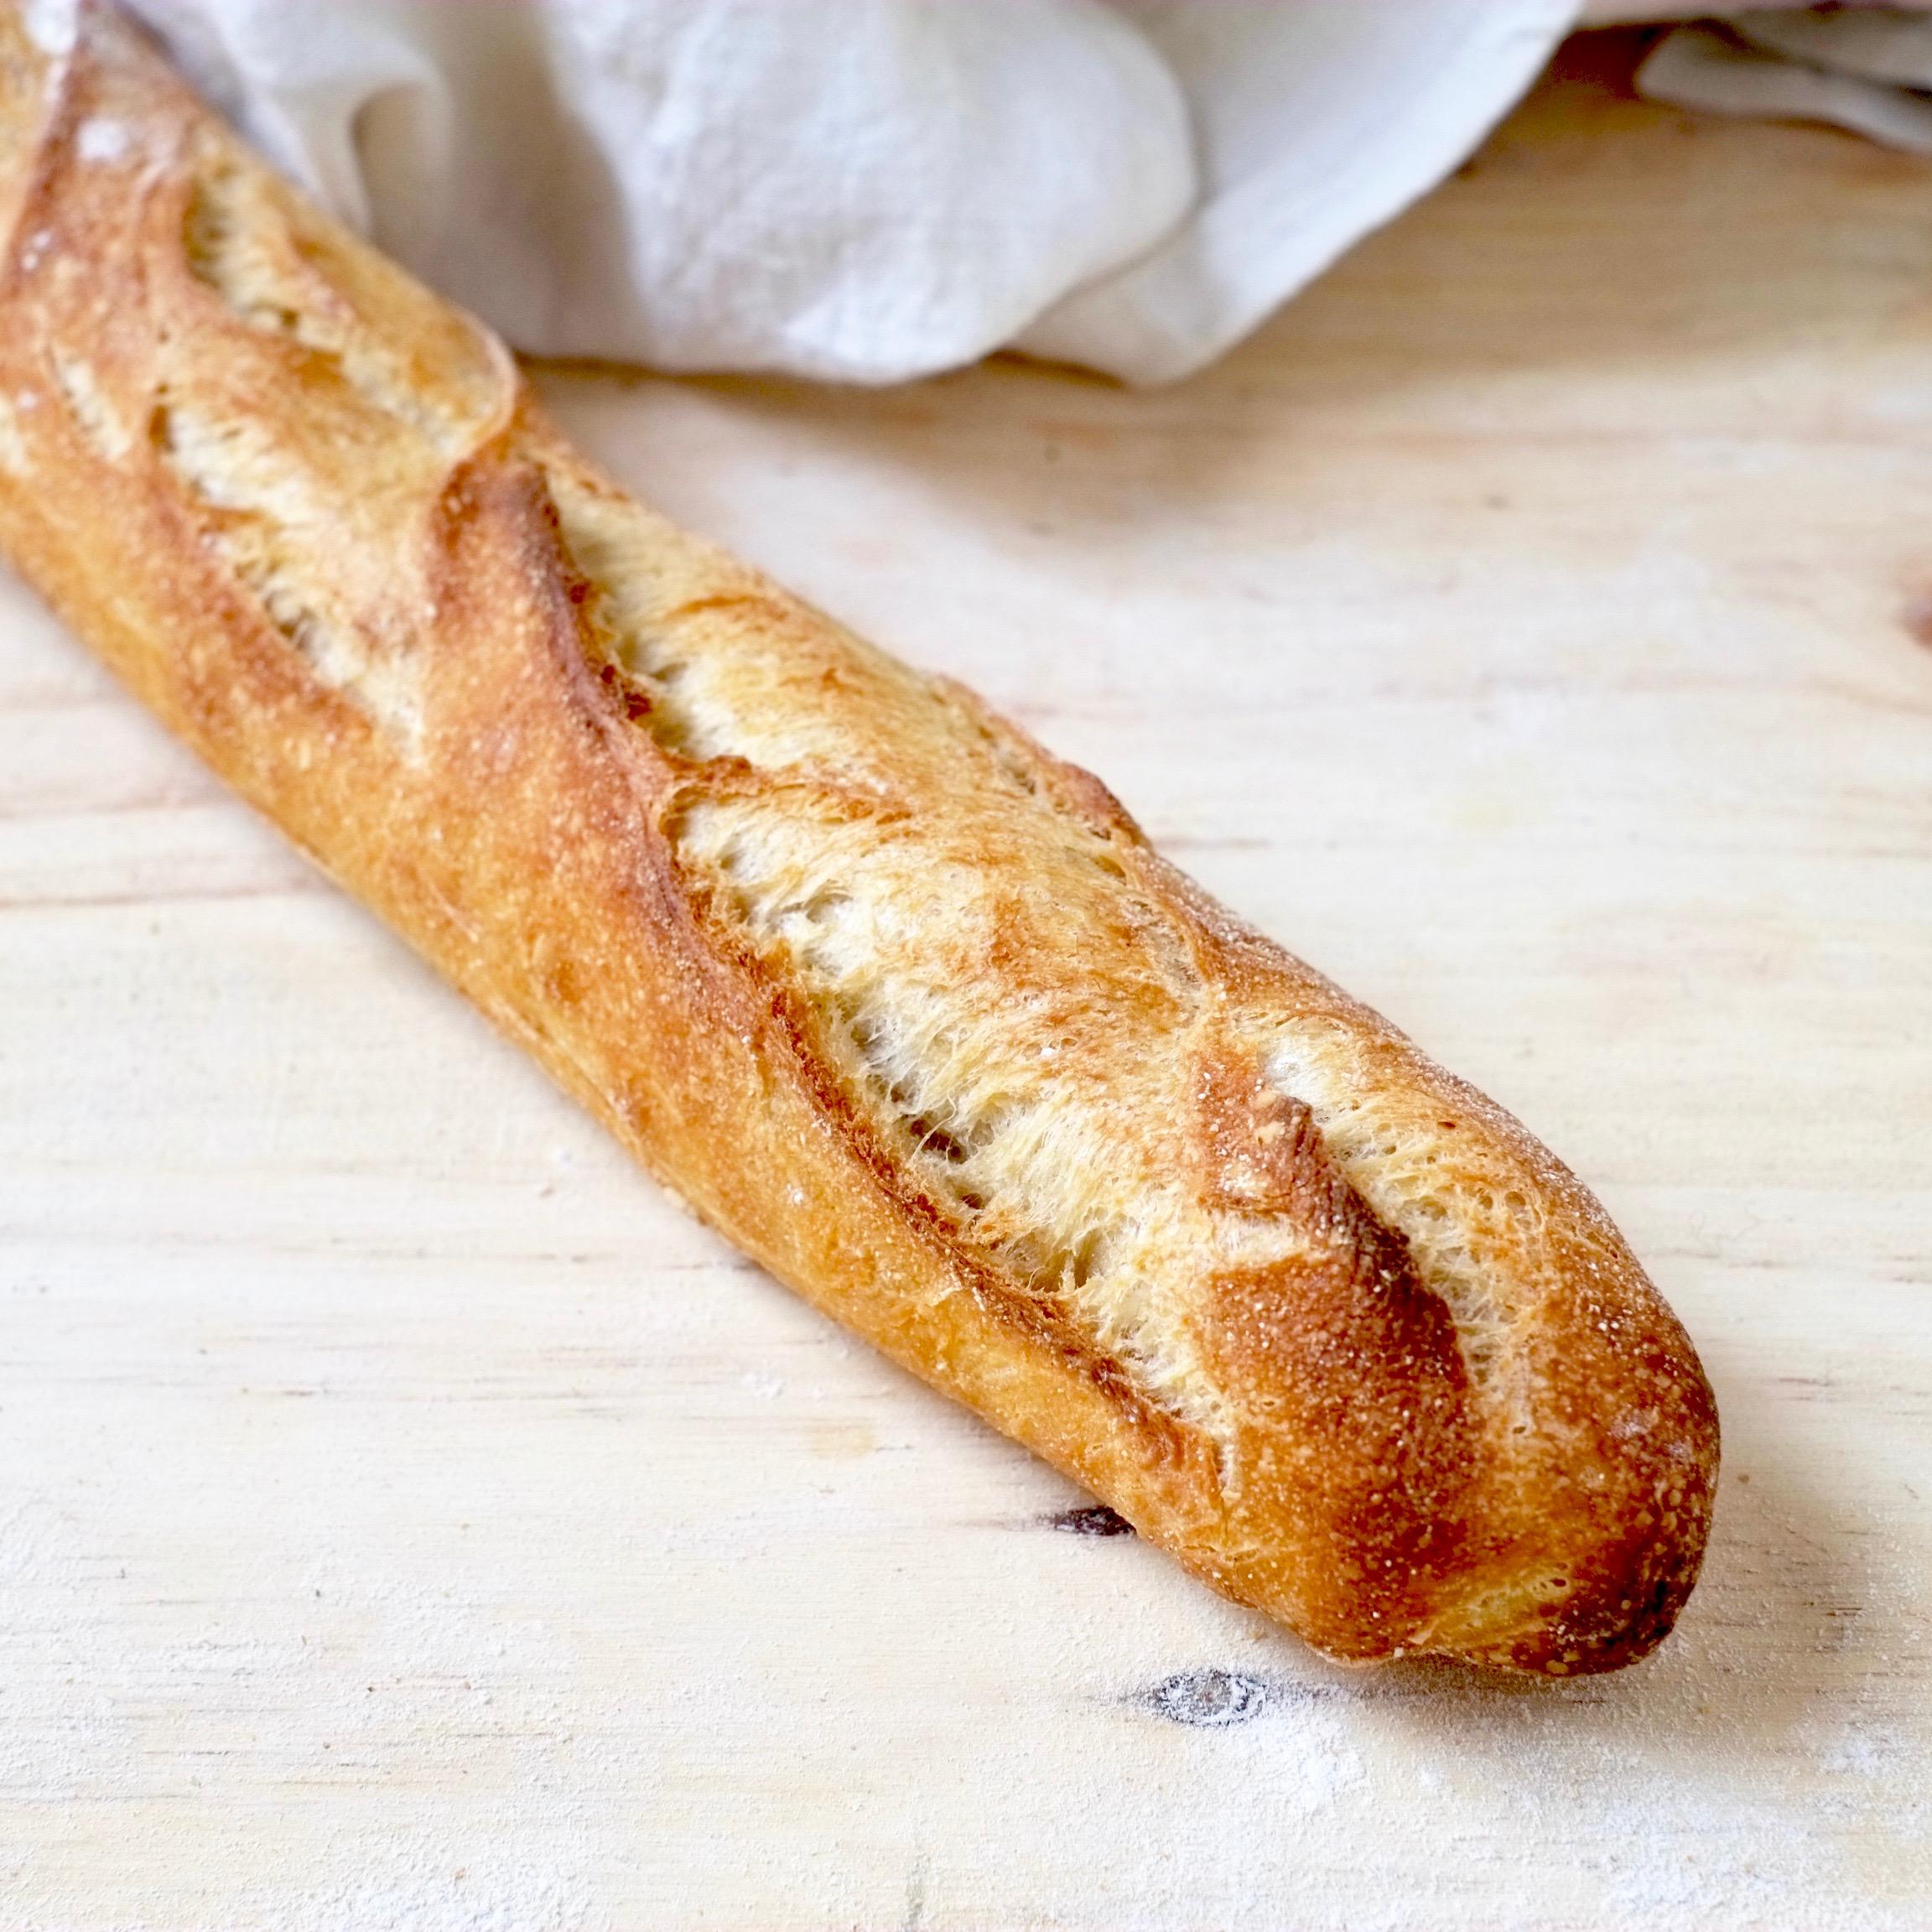 La baguette tradition par Benjamin Turquier